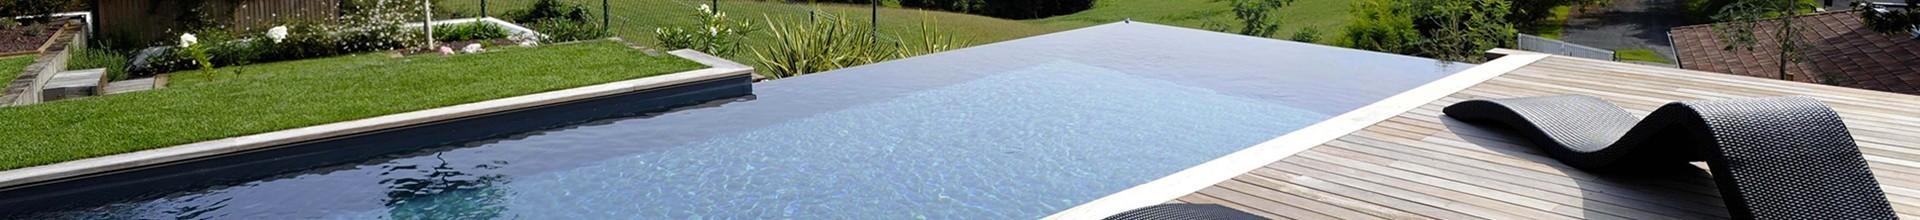 Direct usine, piscine coque prix Genève